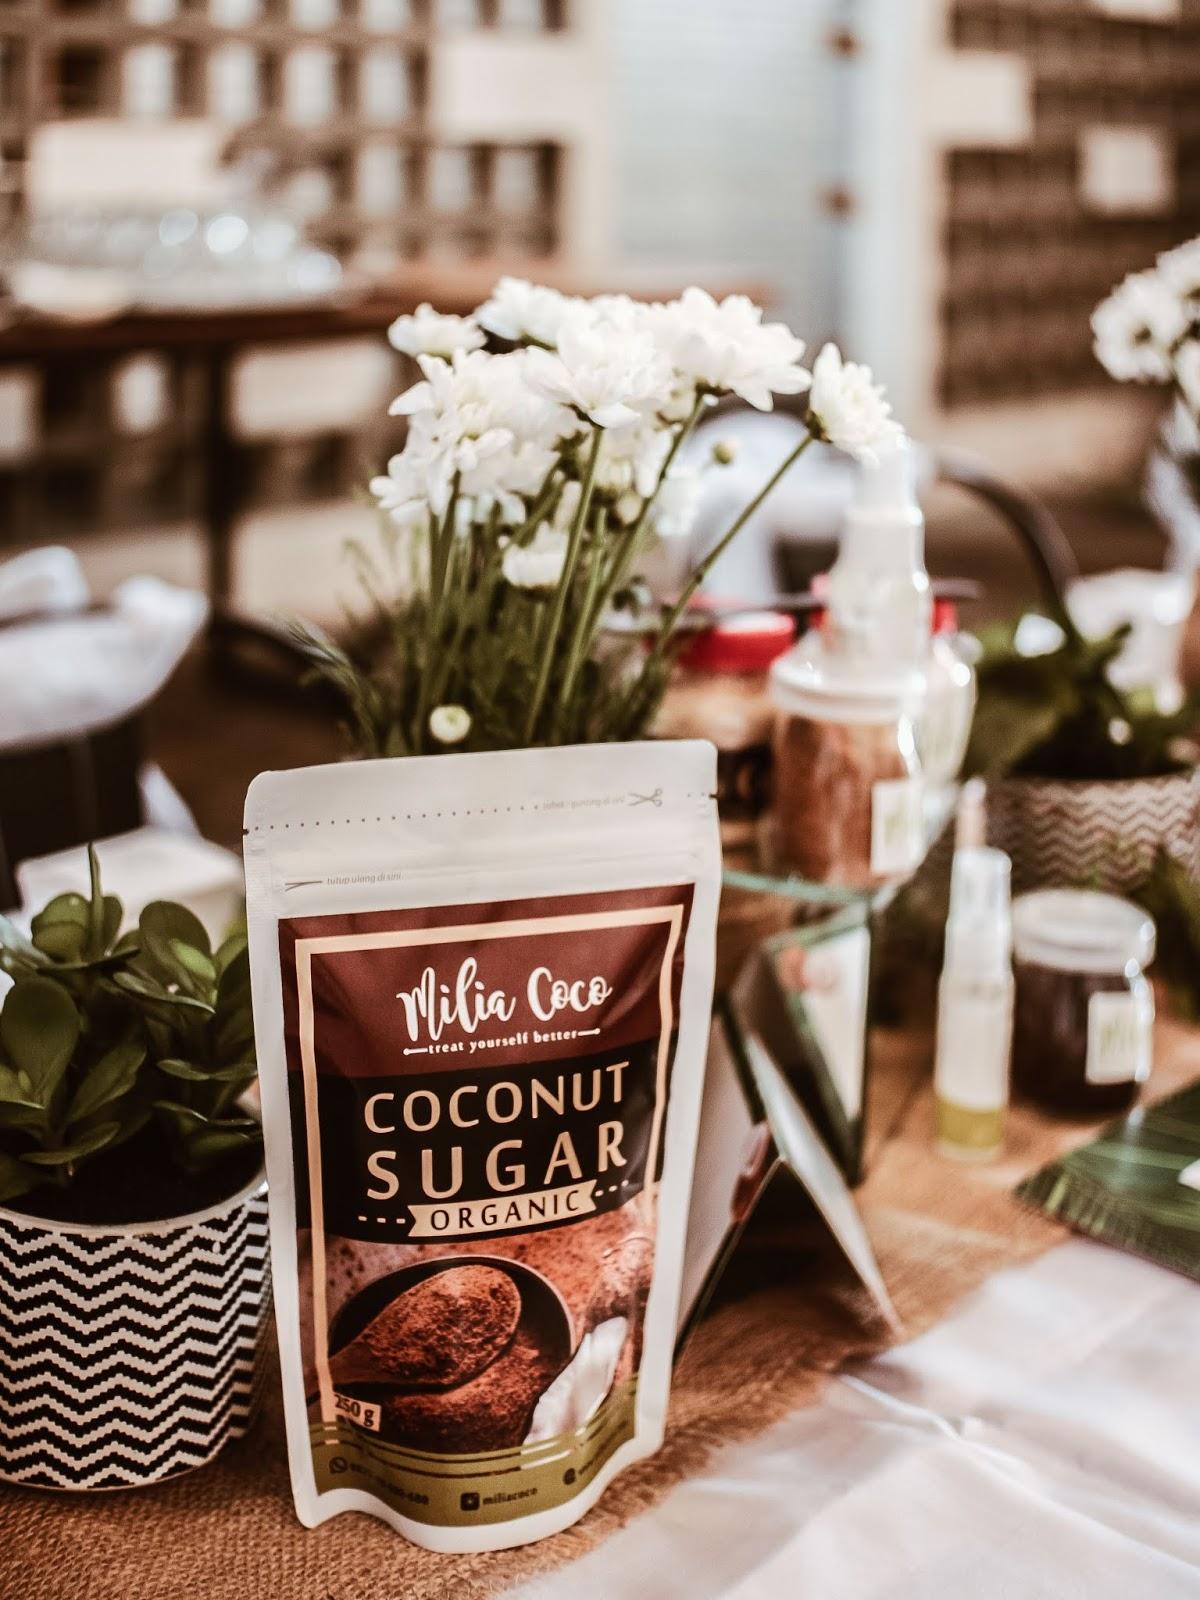 milia coco coconut sugar